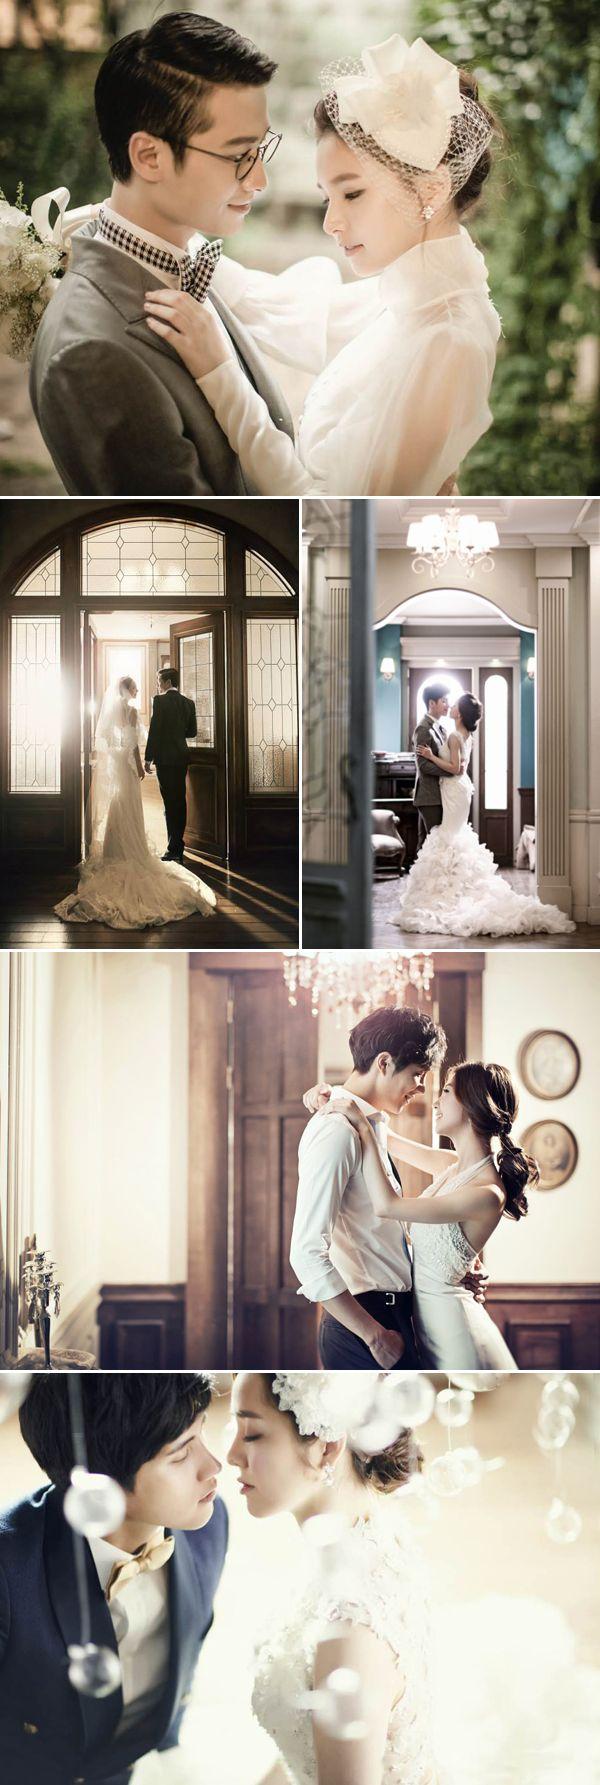 best korean wedding photography images on pinterest